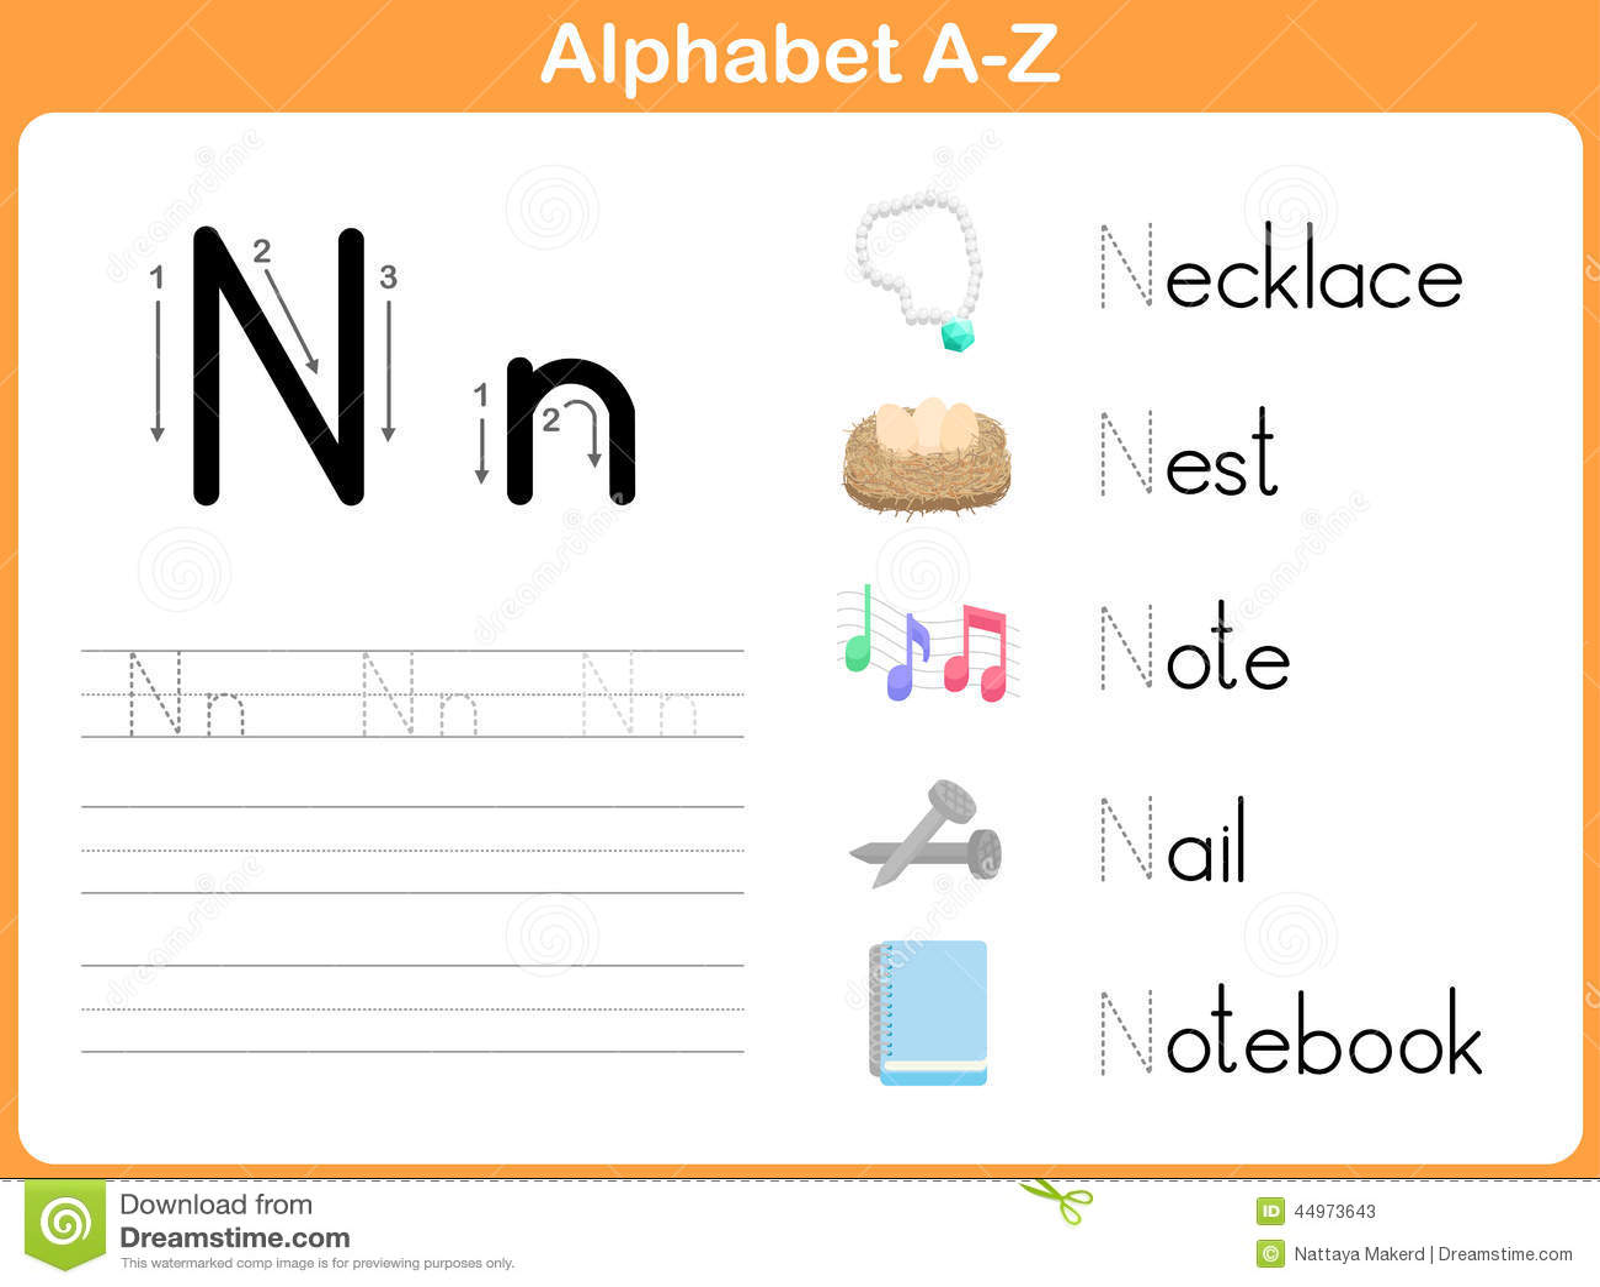 Abc Worksheet